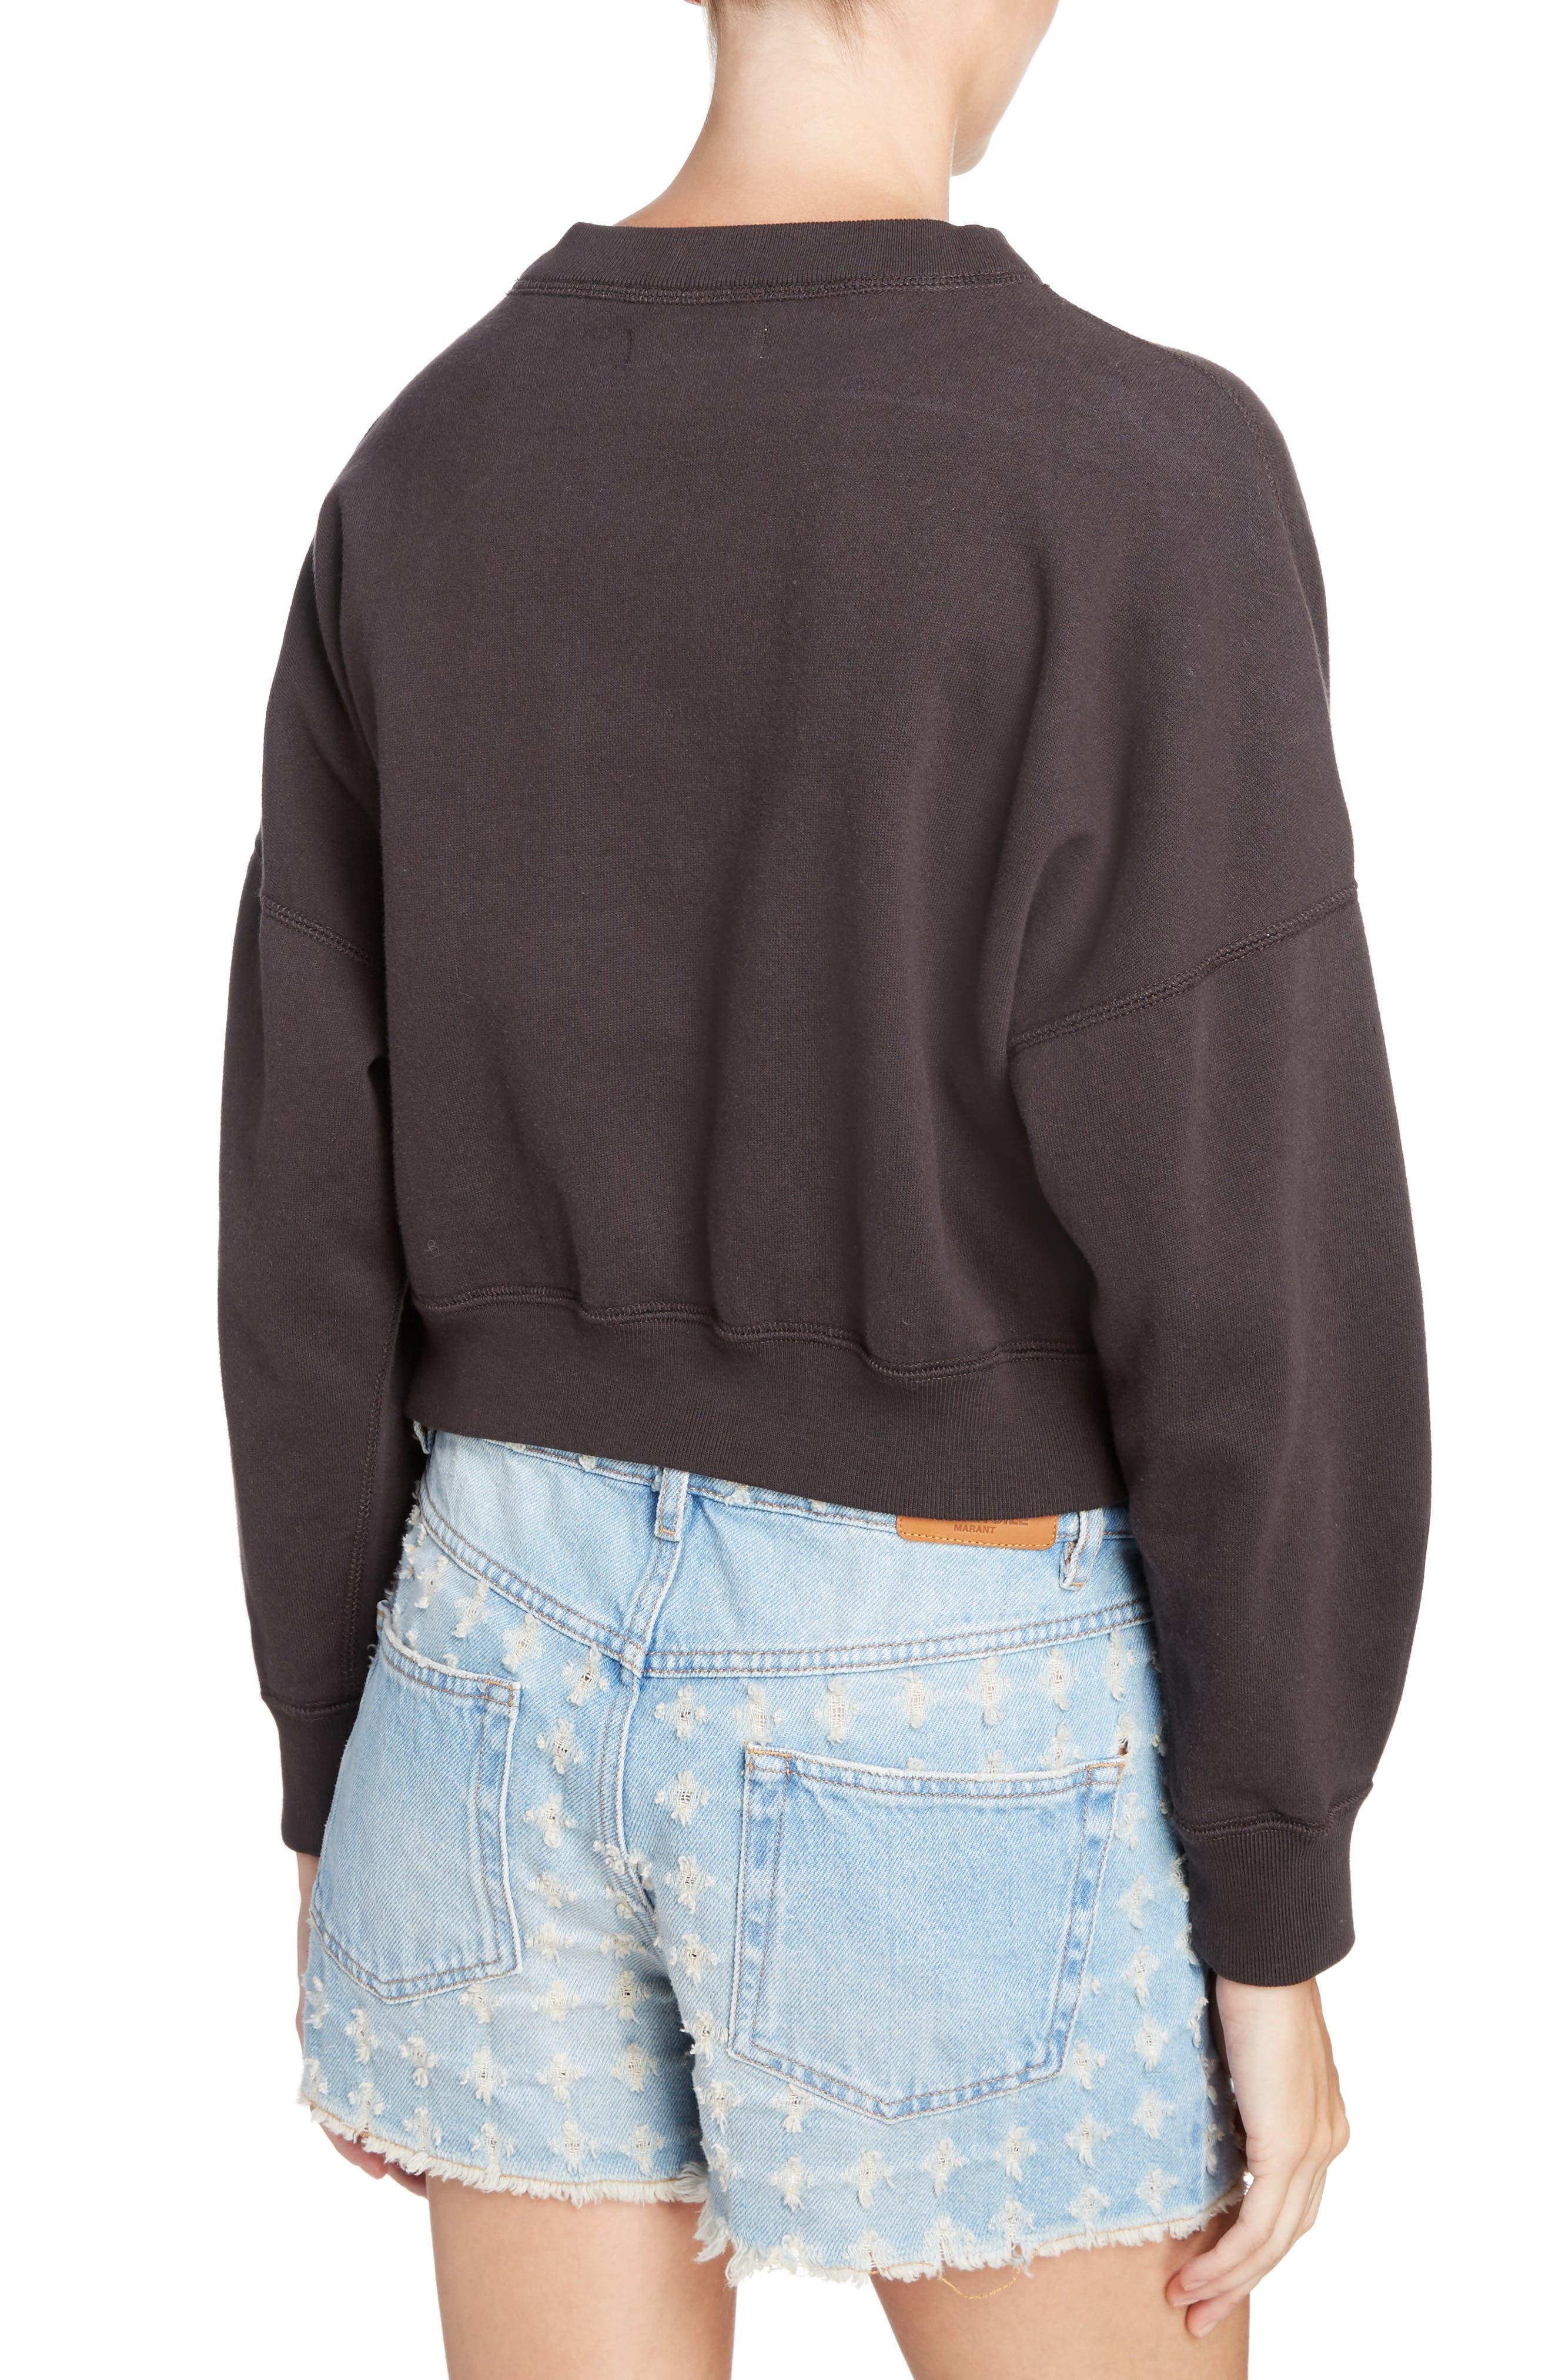 Isabel Marant Étoile Odilon Sweatshirt,                             Alternate thumbnail 2, color,                             Faded Black